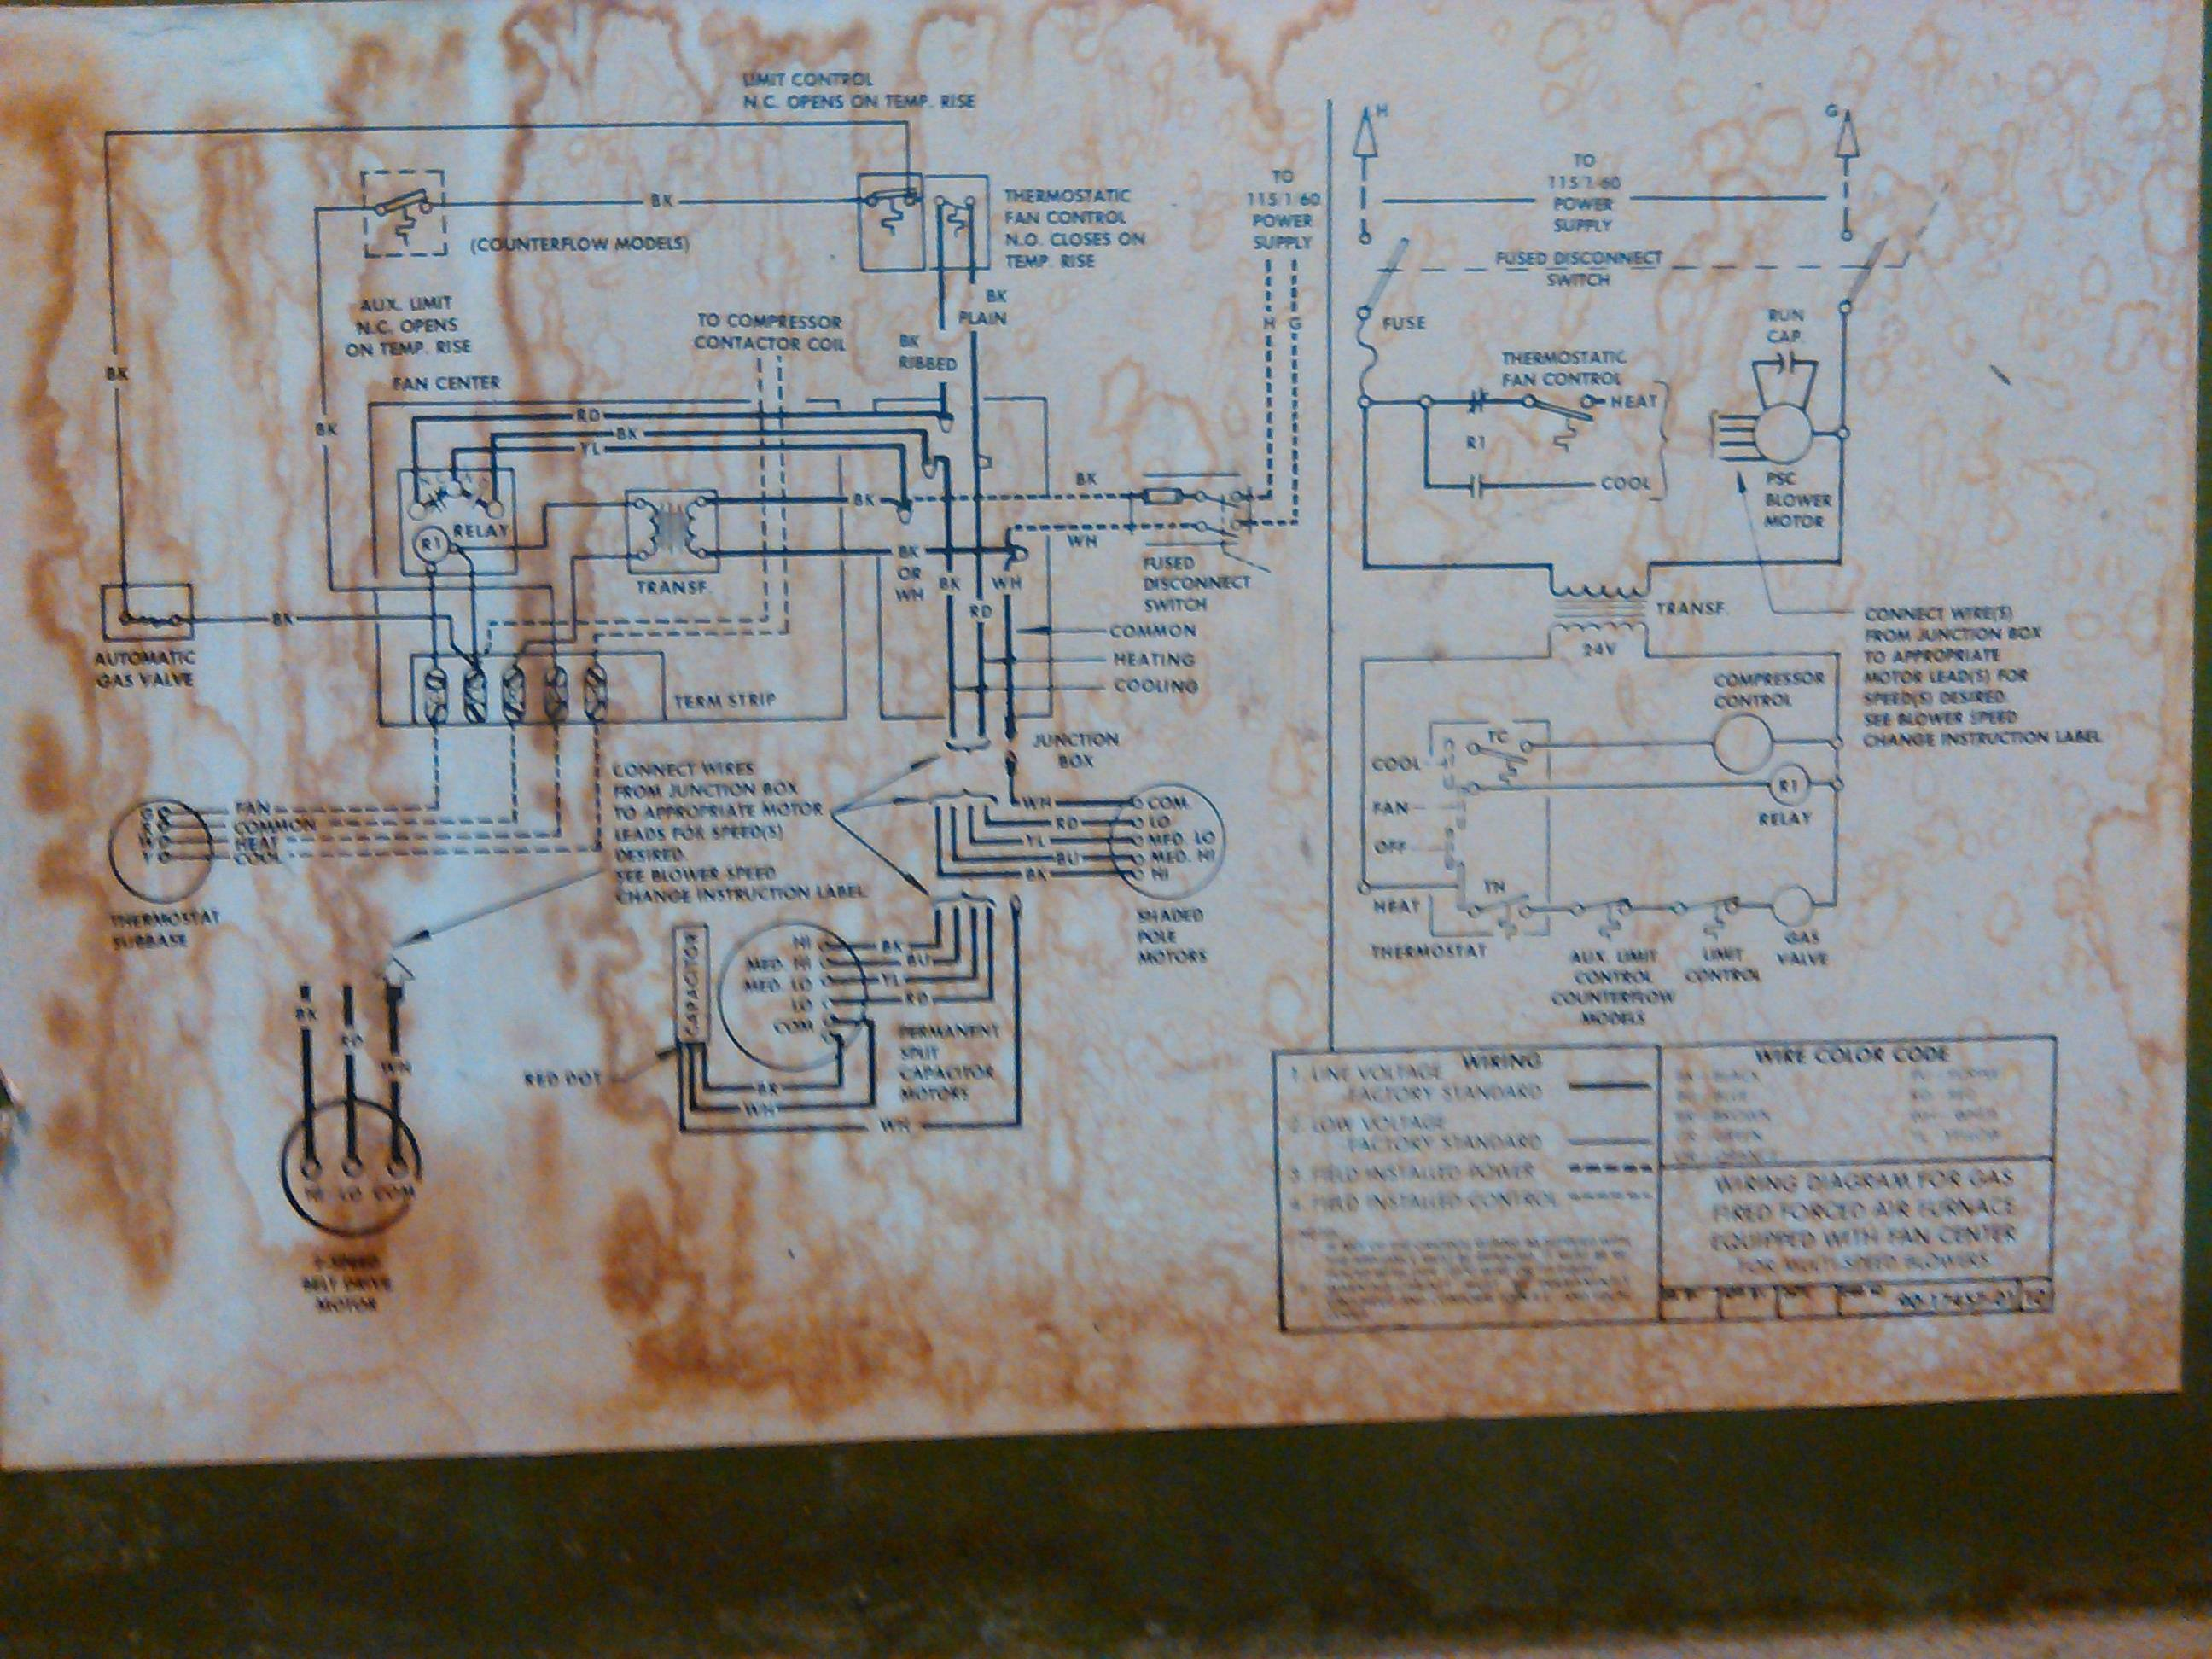 Mars 10585 Blower Motor Wiring Diagram